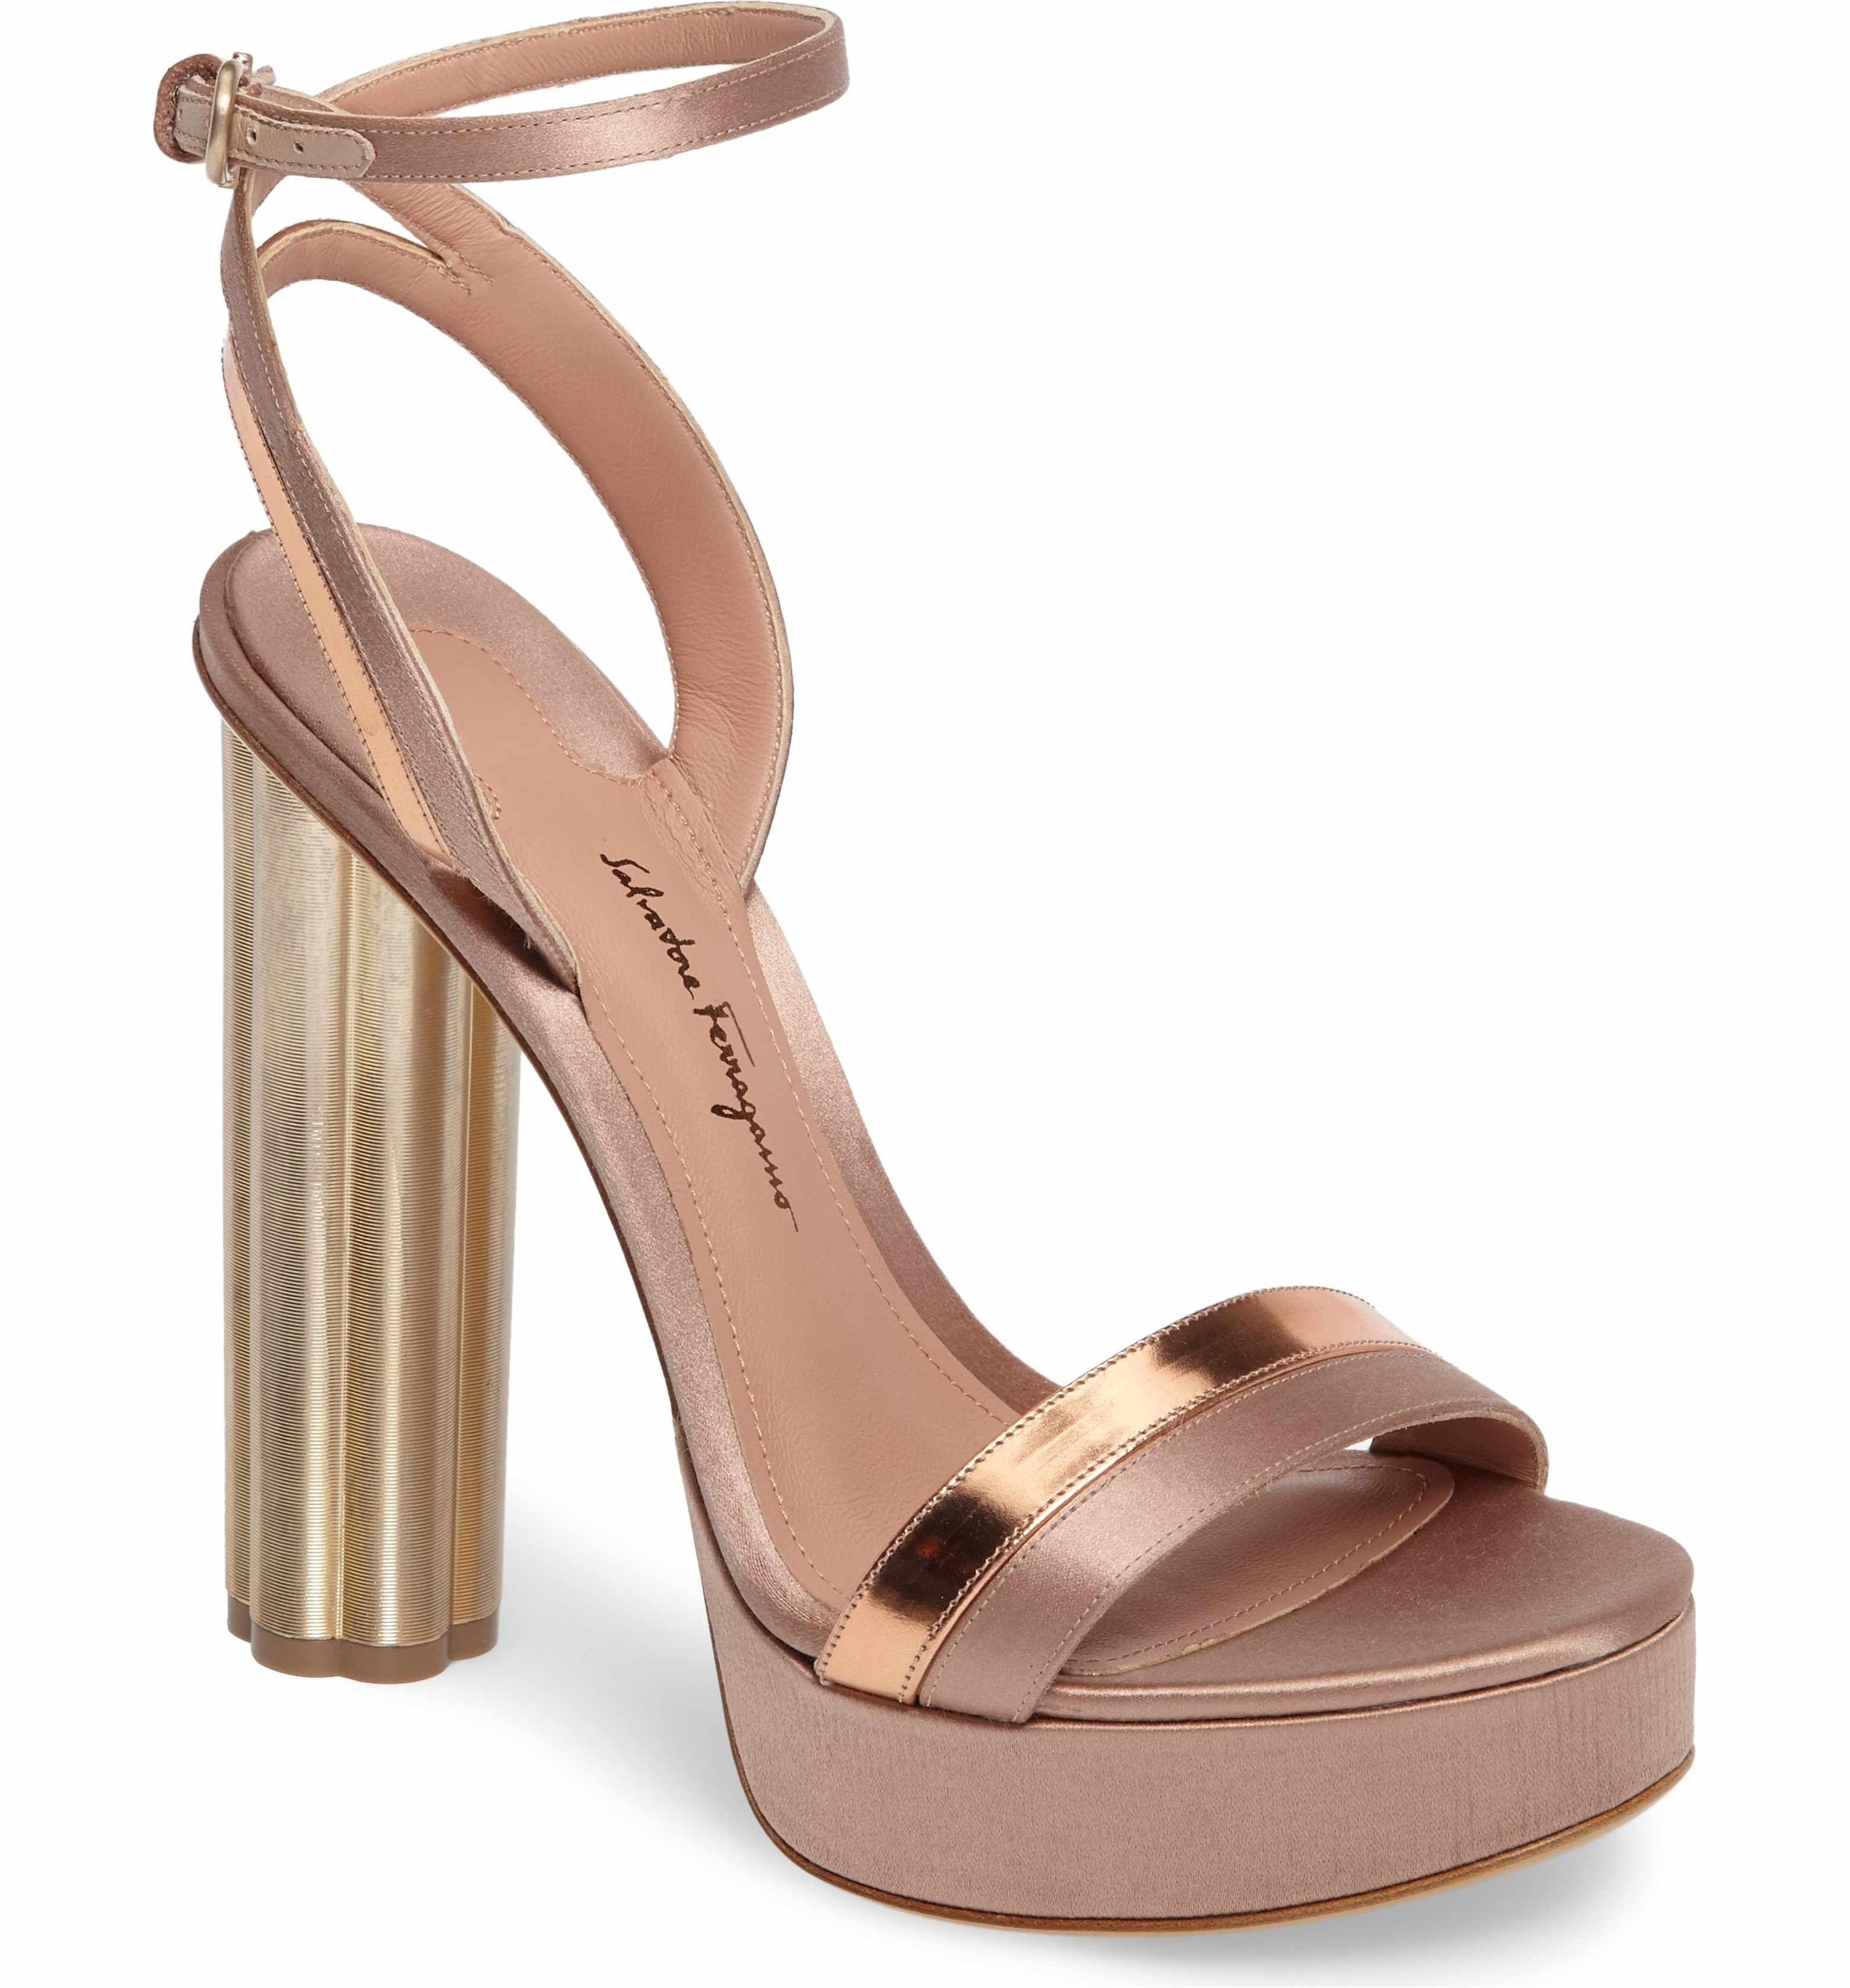 7e273f38c78 Main Image - Salvatore Ferragamo Ischia Ankle Strap Platform Sandal (Women)